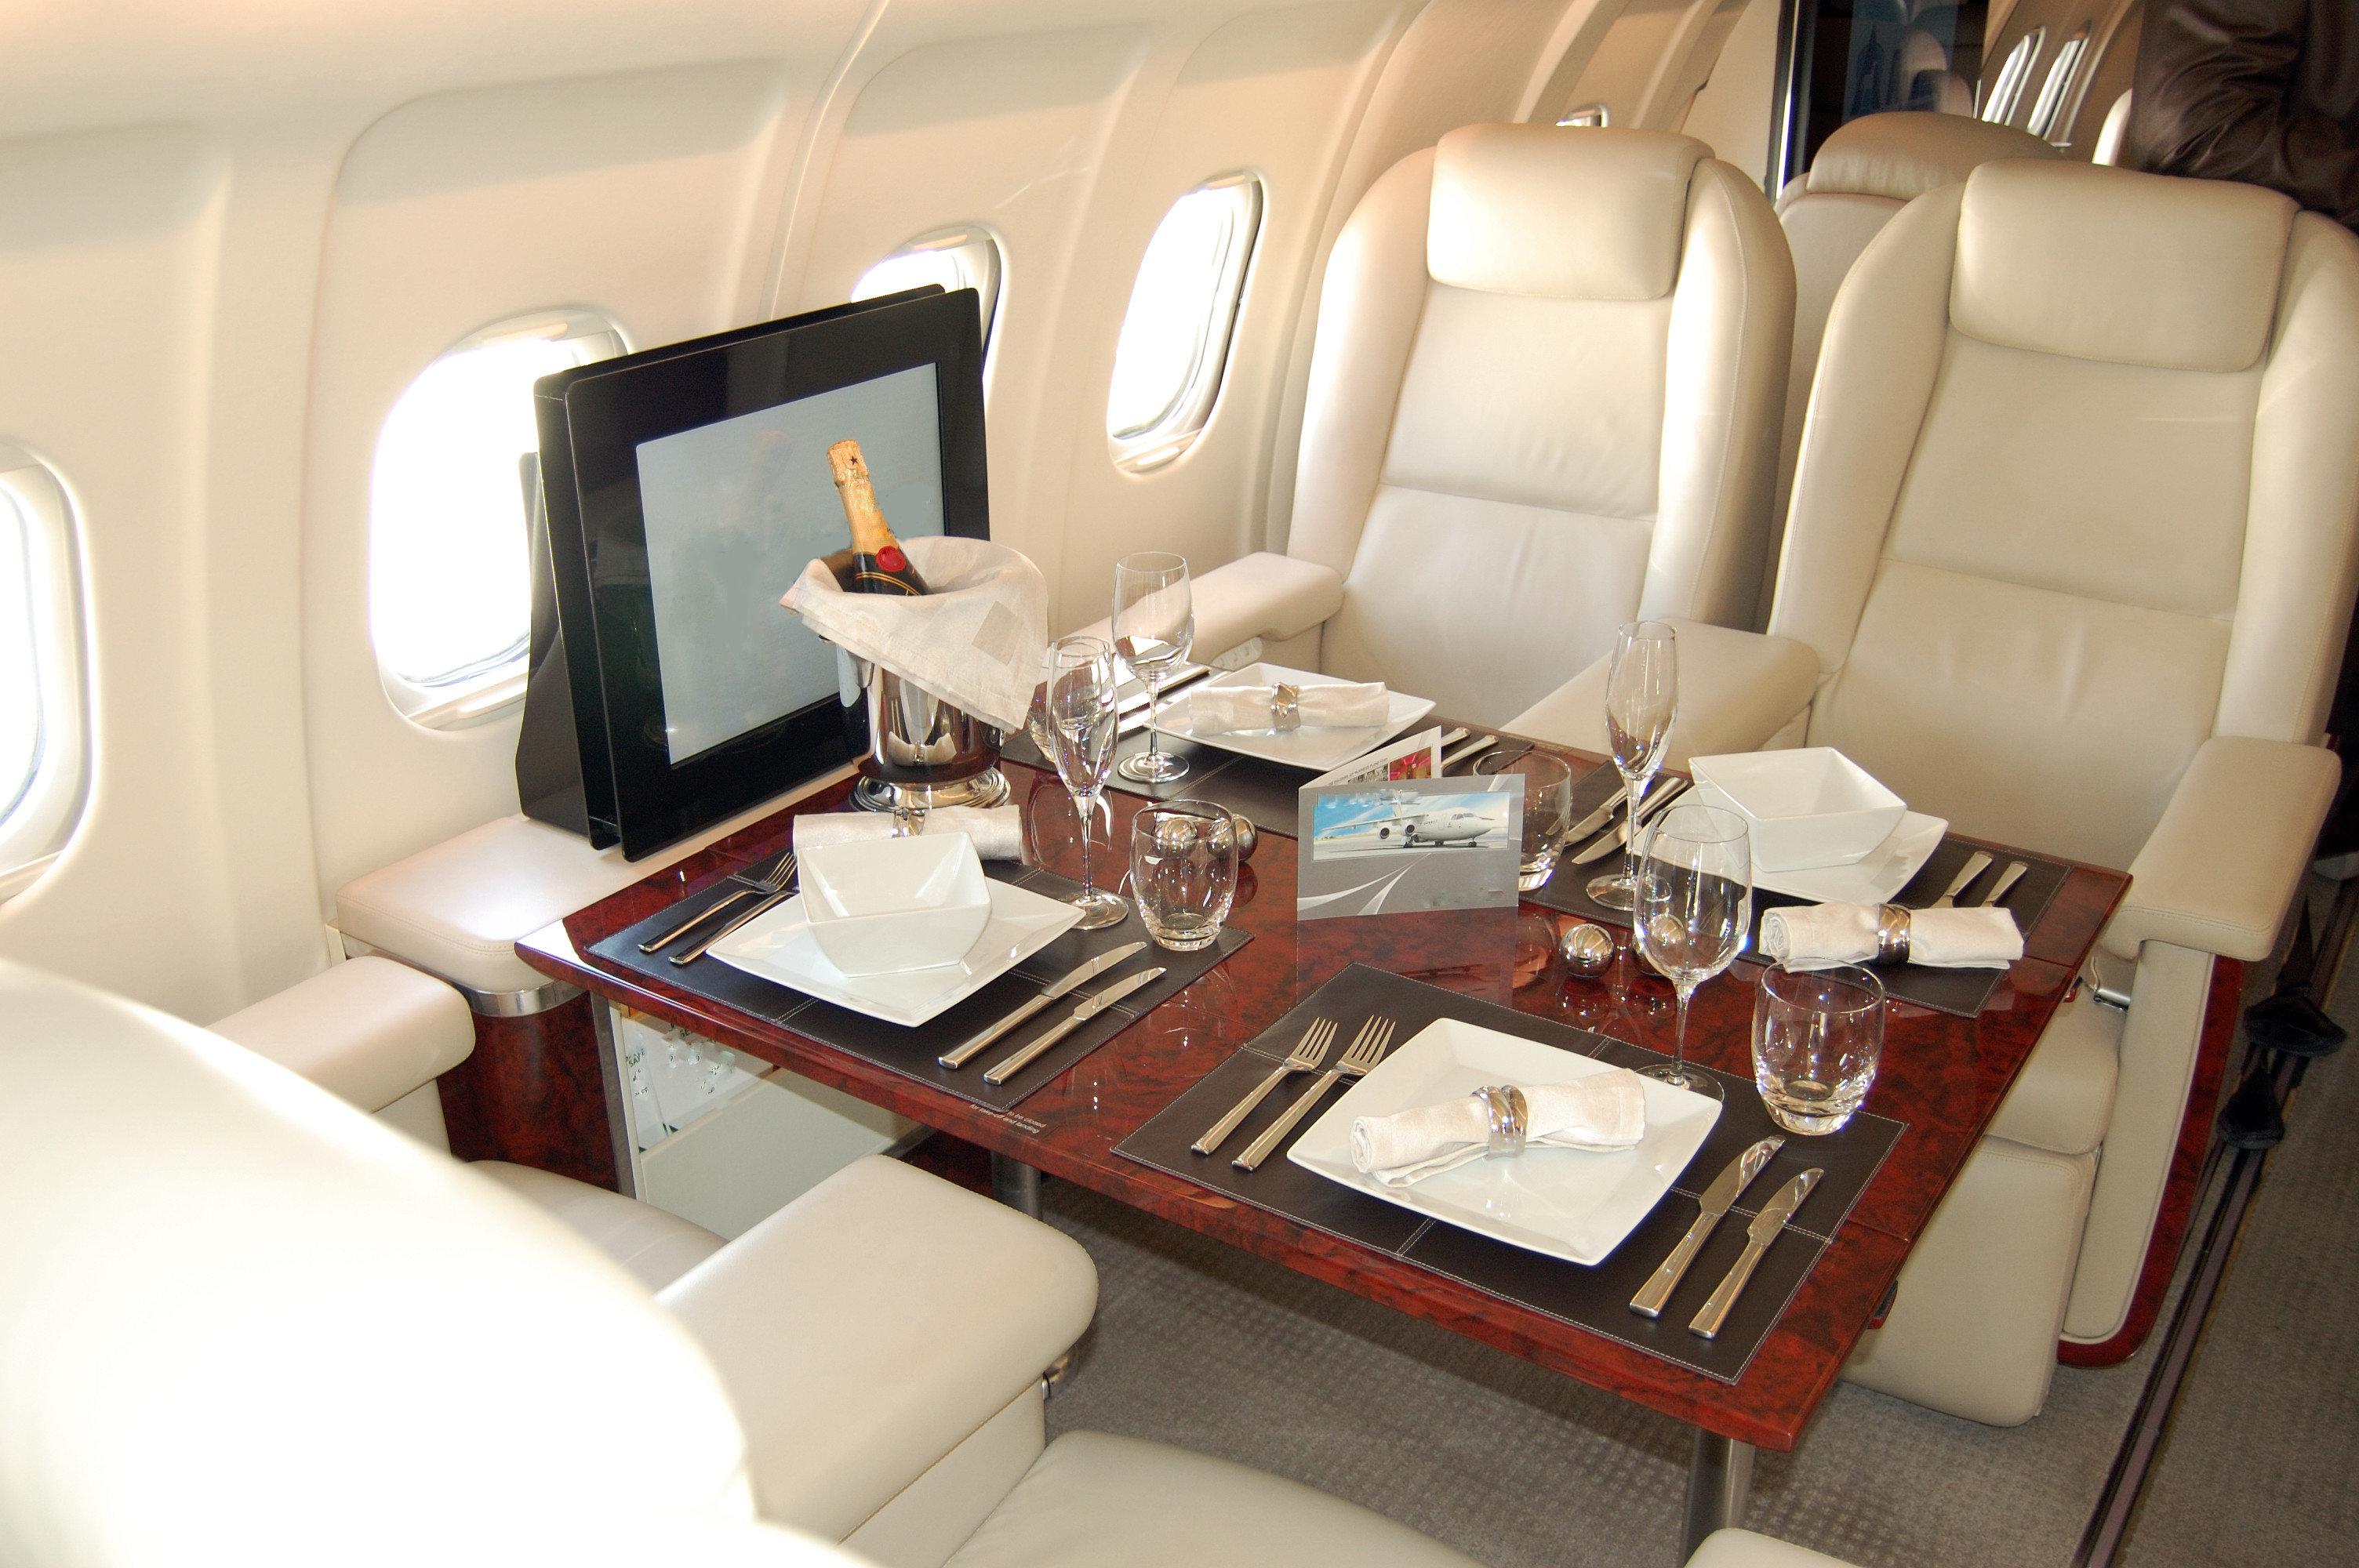 Flights Travel Tips indoor floor vehicle room Boat Cabin airline yacht Living passenger ship luxury yacht luxury vehicle interior design seat furniture